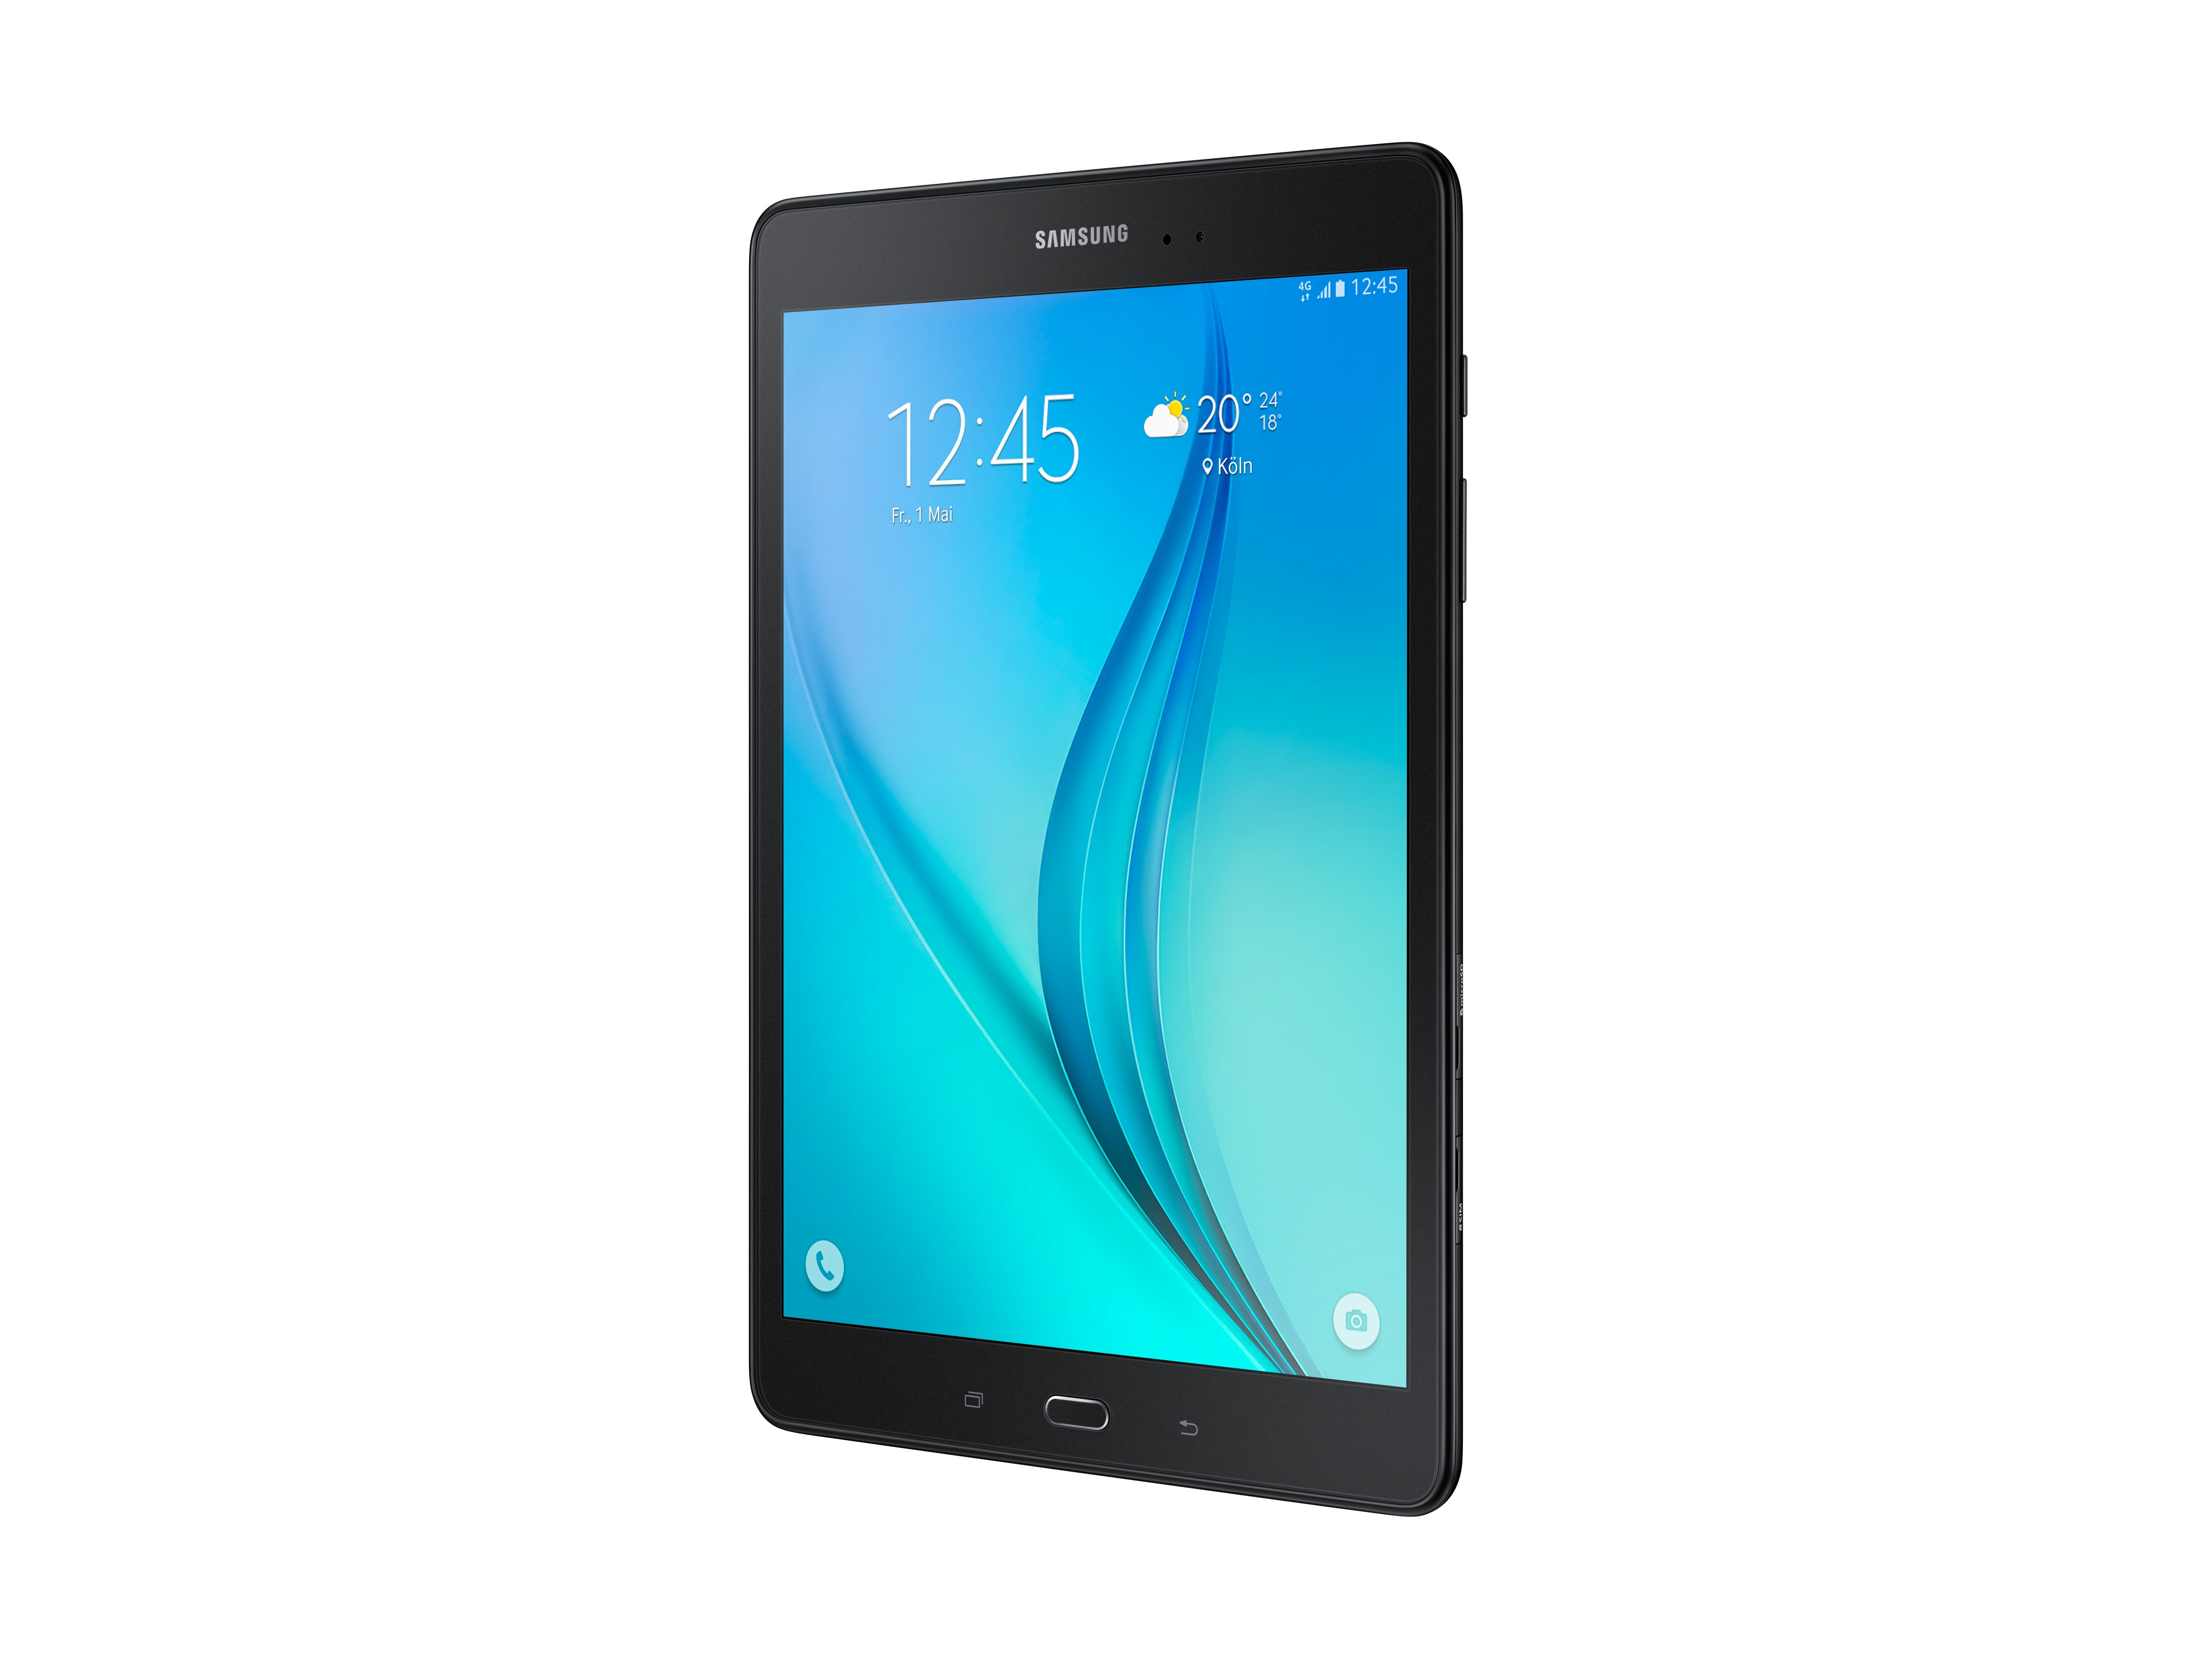 Samsung Galaxy Tab A 9.7 SM-T555 Tablet Review ...